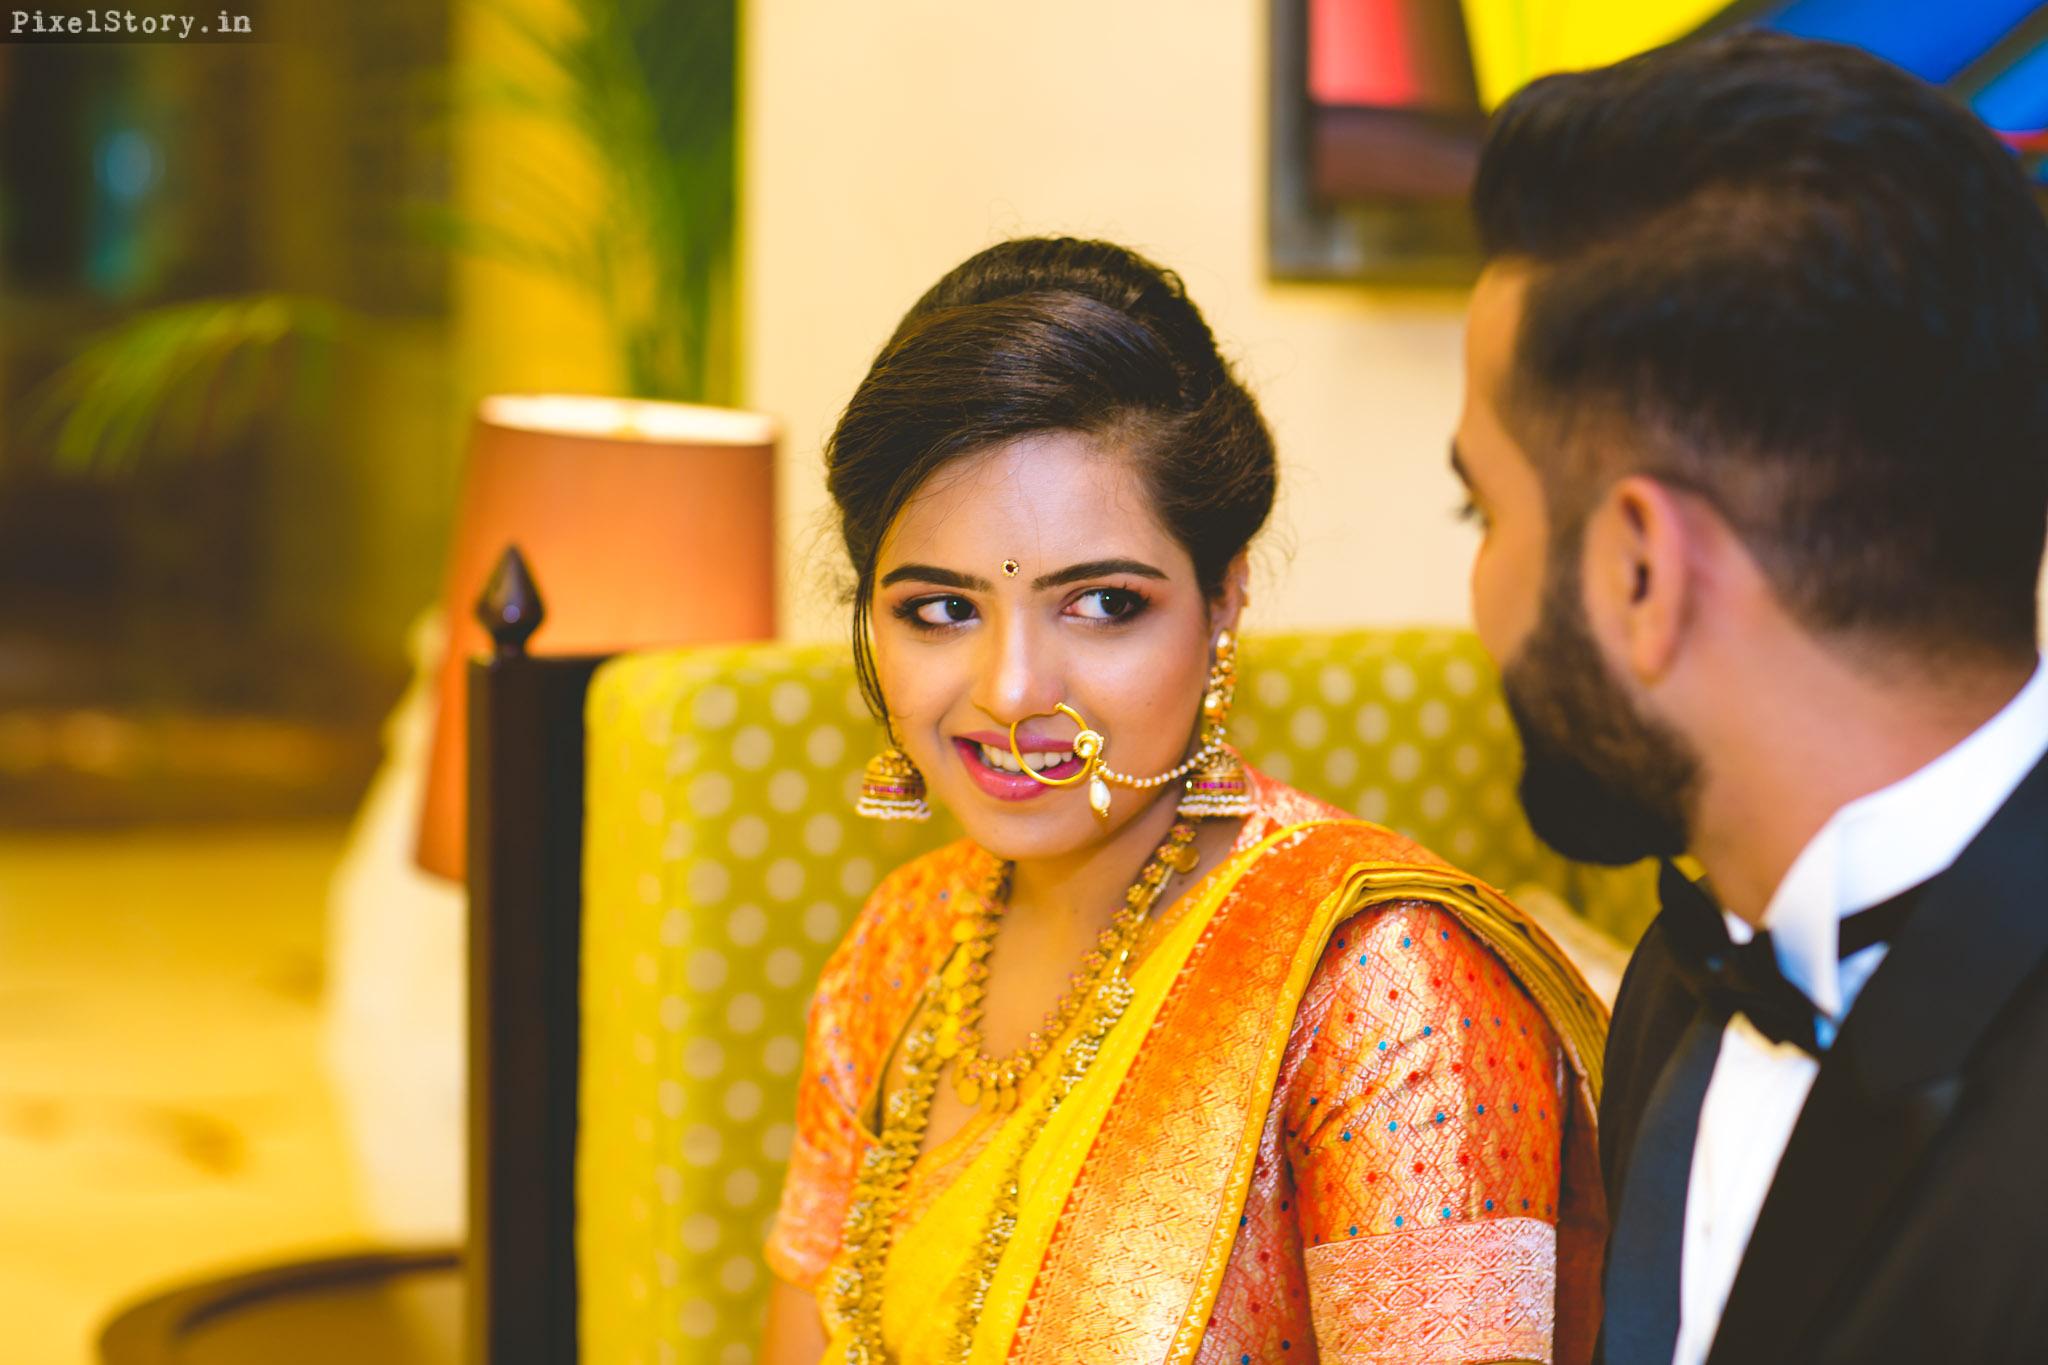 PixelStory-Engagement-Ritz-Carlton-Preksha-Bharath-006.jpg